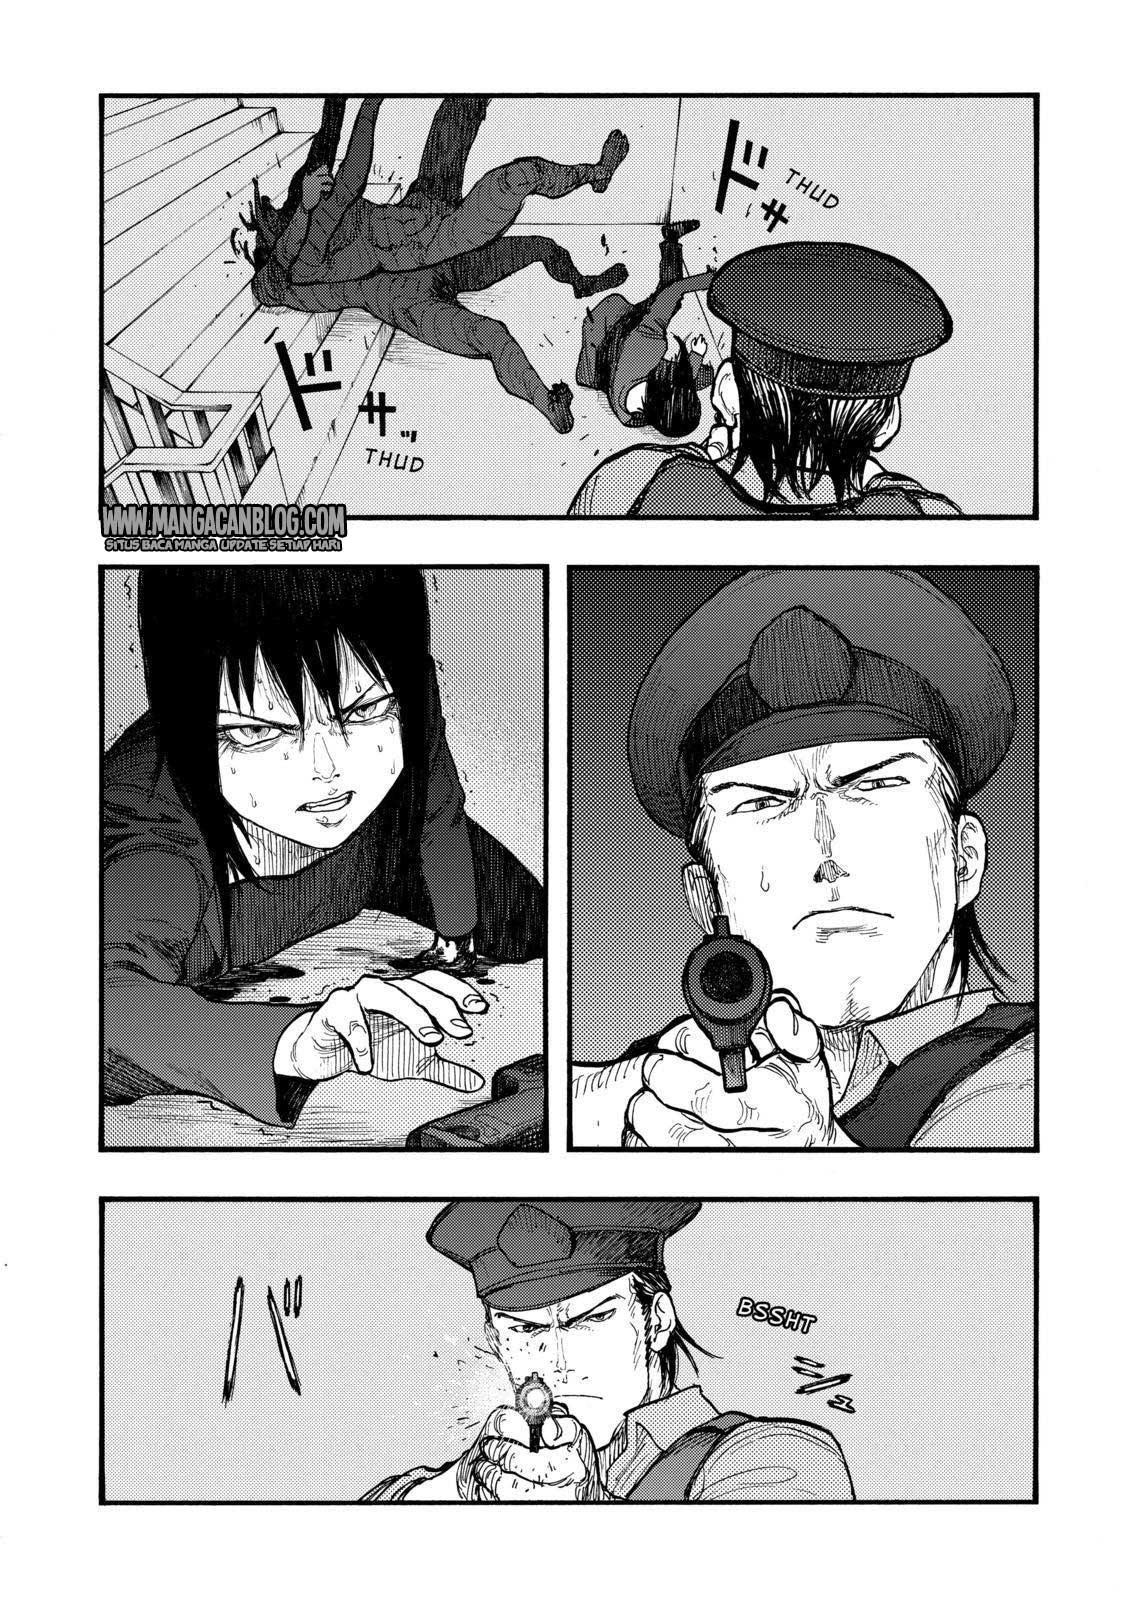 Dilarang COPAS - situs resmi www.mangacanblog.com - Komik ajin 039 - garis keras medan pertempuran 2 40 Indonesia ajin 039 - garis keras medan pertempuran 2 Terbaru 16|Baca Manga Komik Indonesia|Mangacan